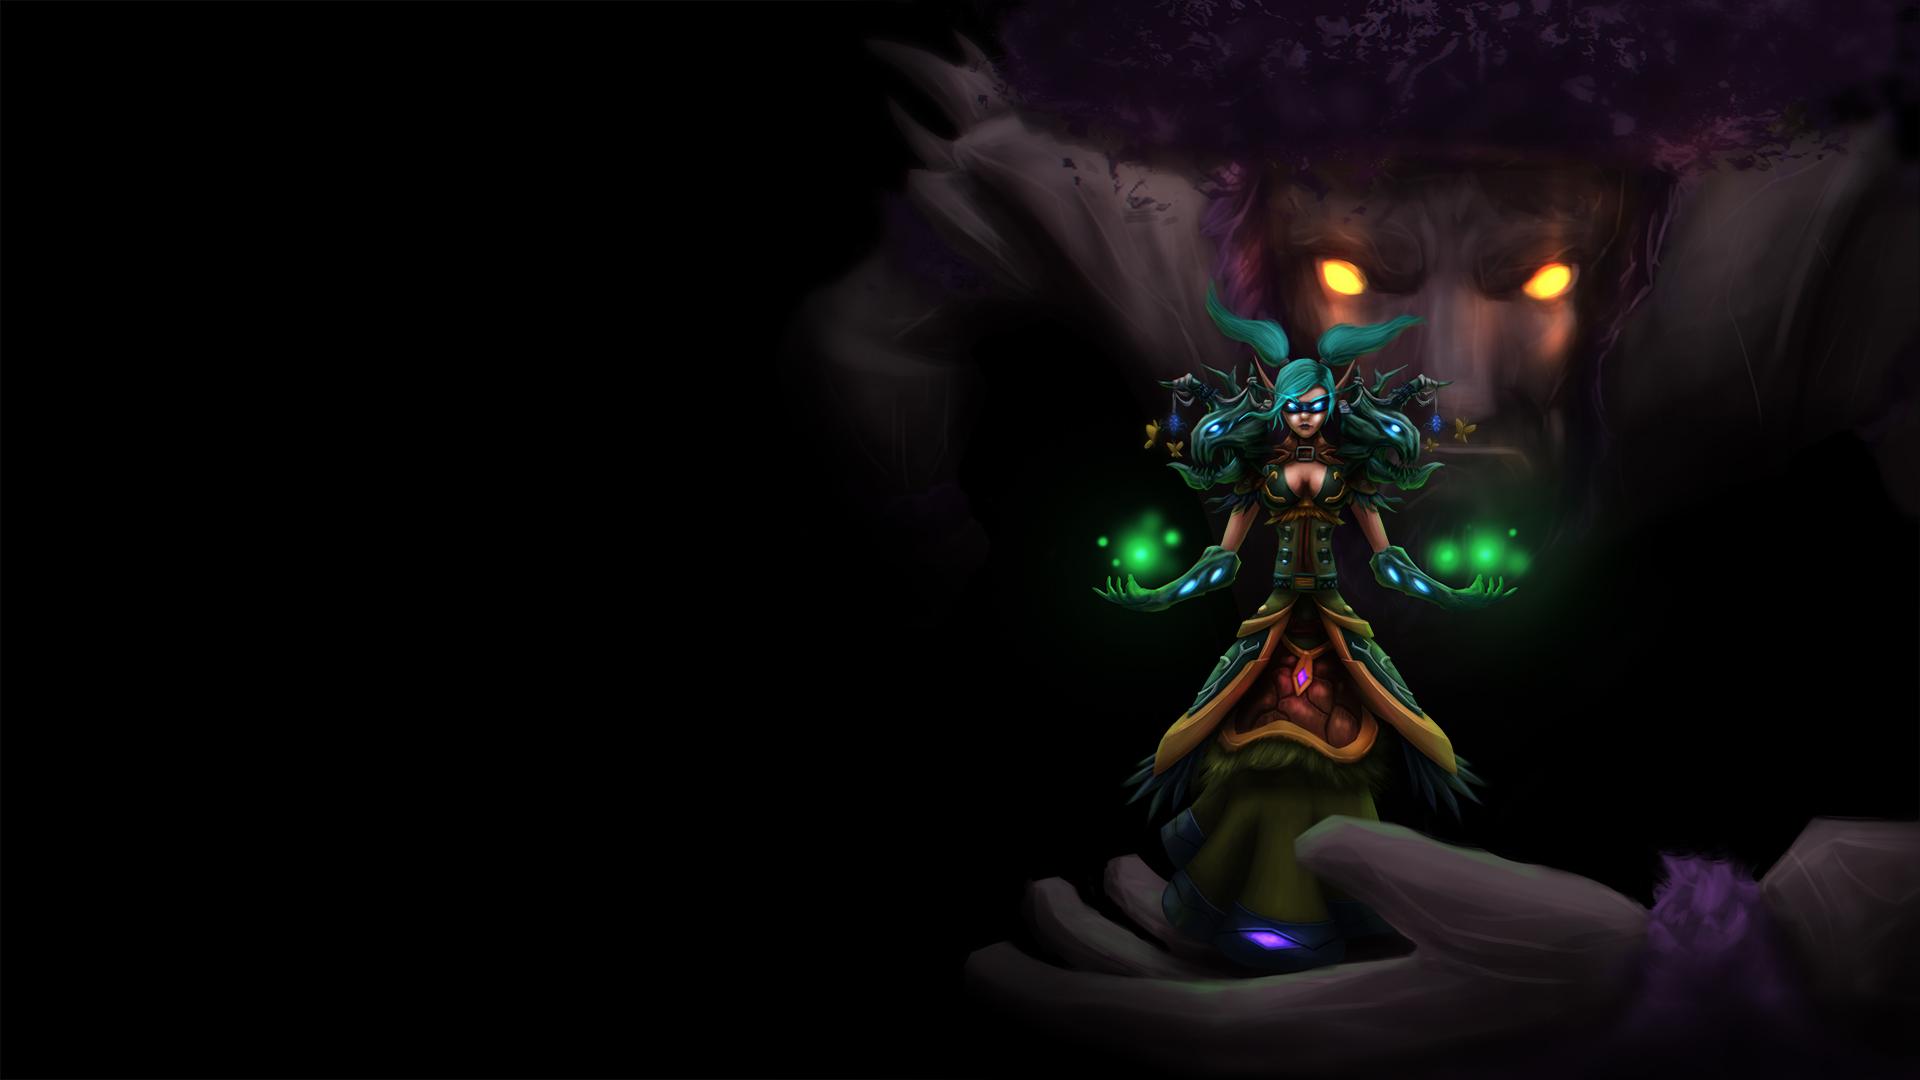 World Of Warcraft Resto Druid By Oshaddixo On Deviantart